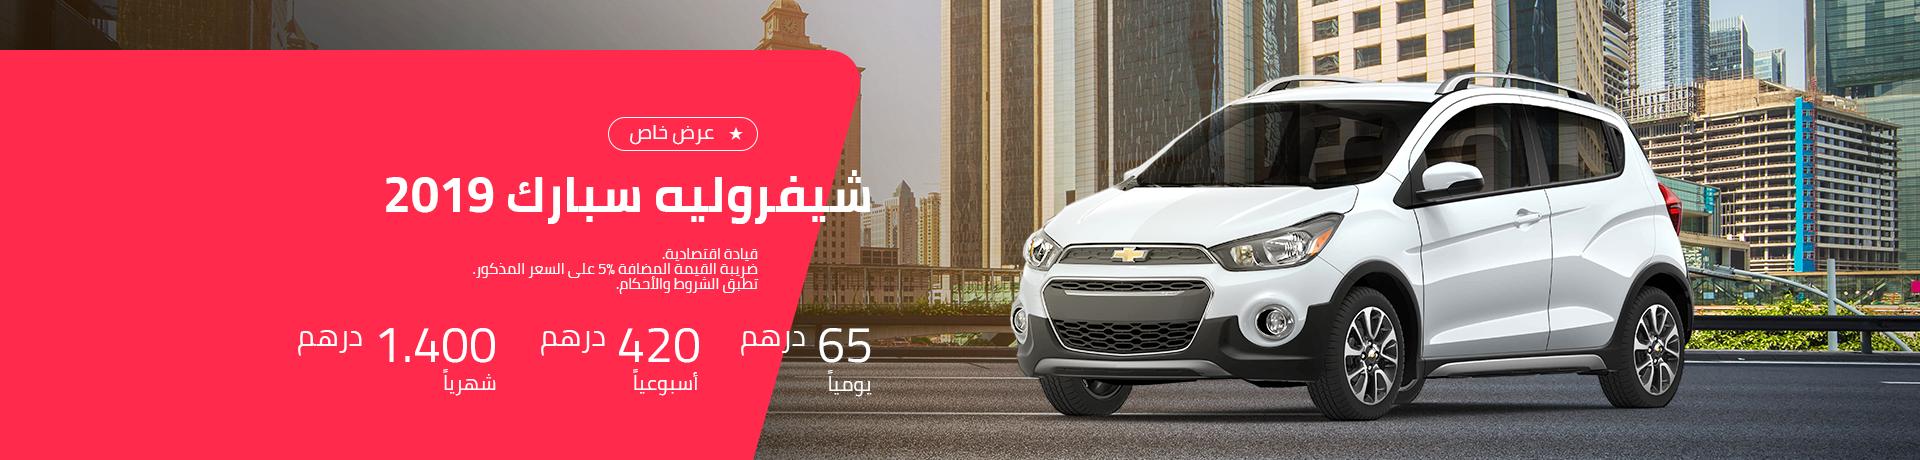 Pin By العماد كارز لتأجير السيارات On Https Al Emadcars Com Ar Car Vehicles 65th